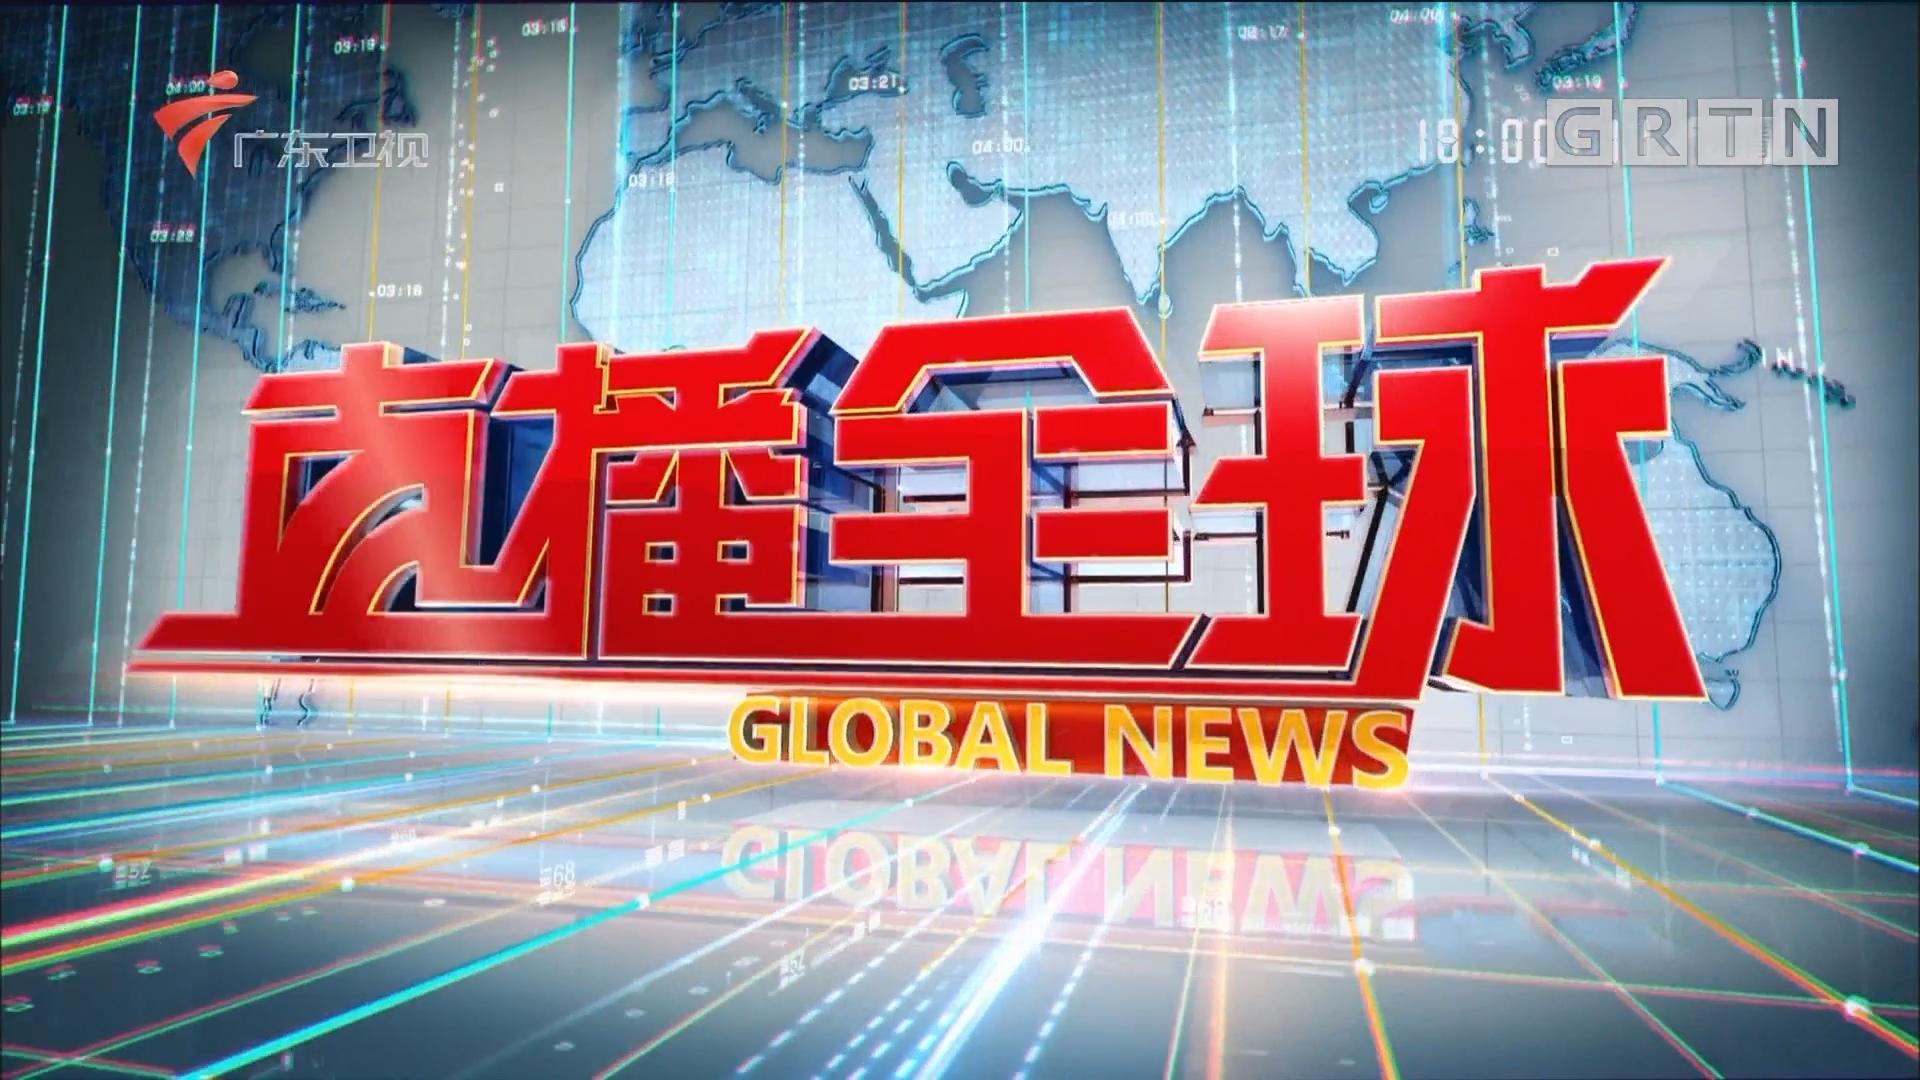 [HD][2018-02-02]直播全球:纪录片作礼物有何深意? 梅首相的礼物:纪录片《蓝色星球2》